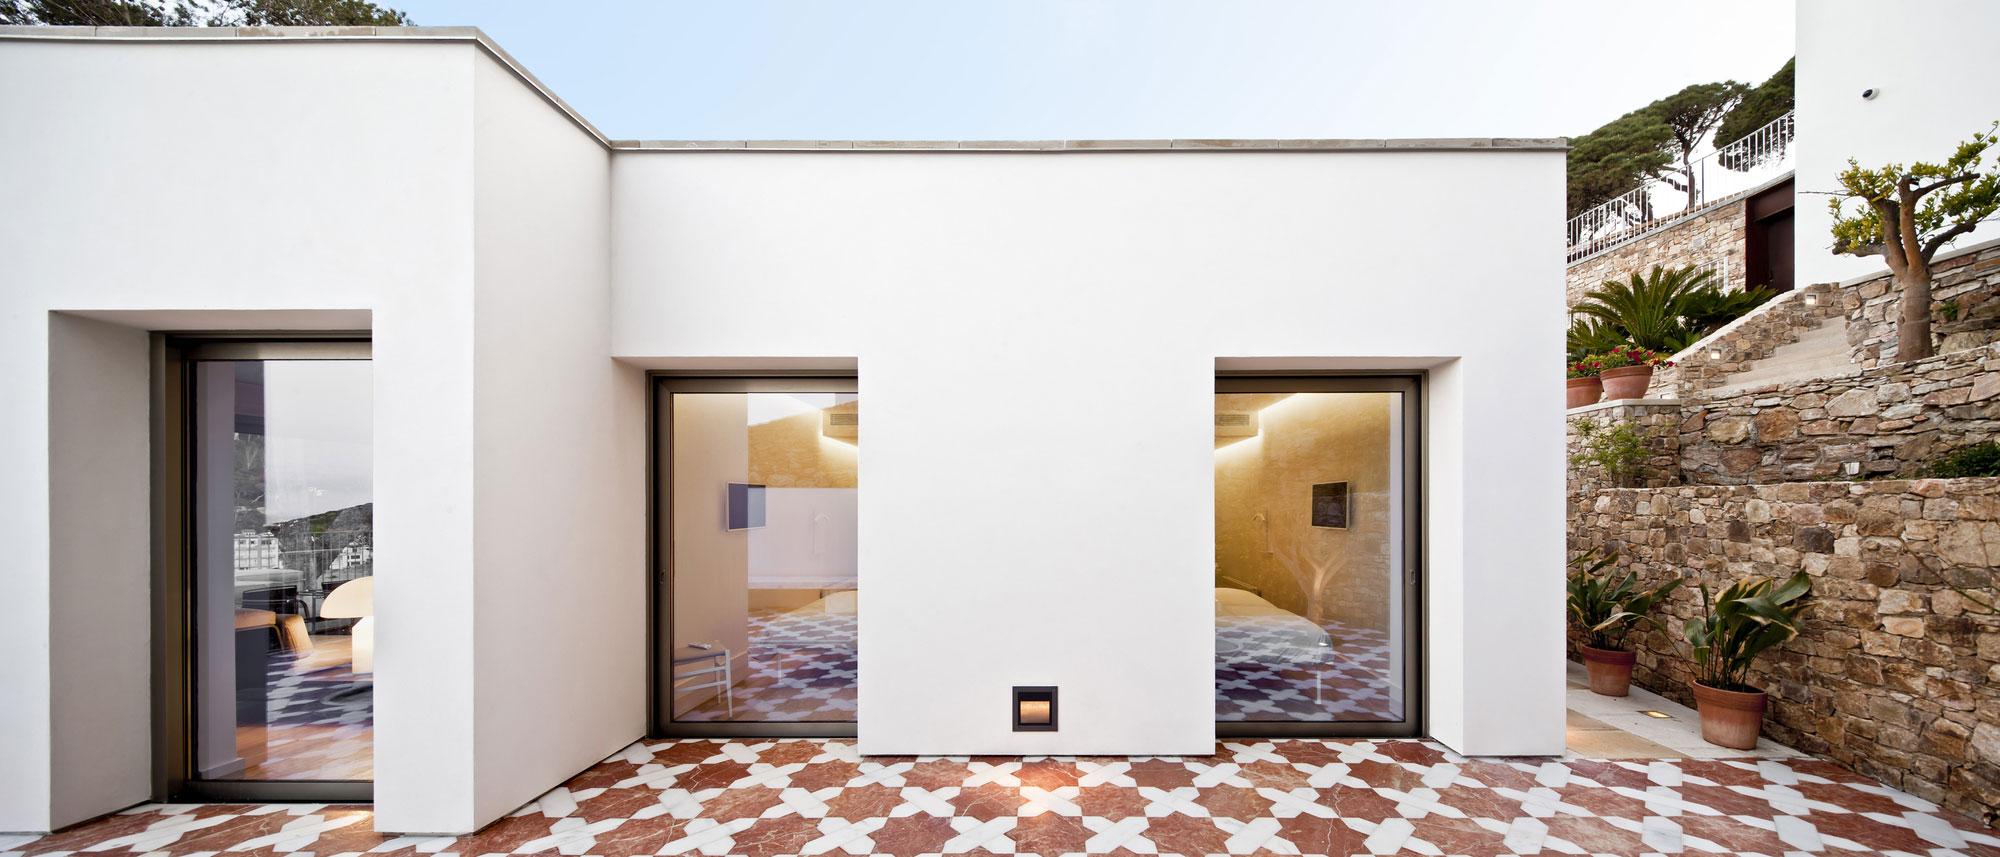 Glass Doors, Marble Terrace, Waterfront House in Costa Brava, Spain